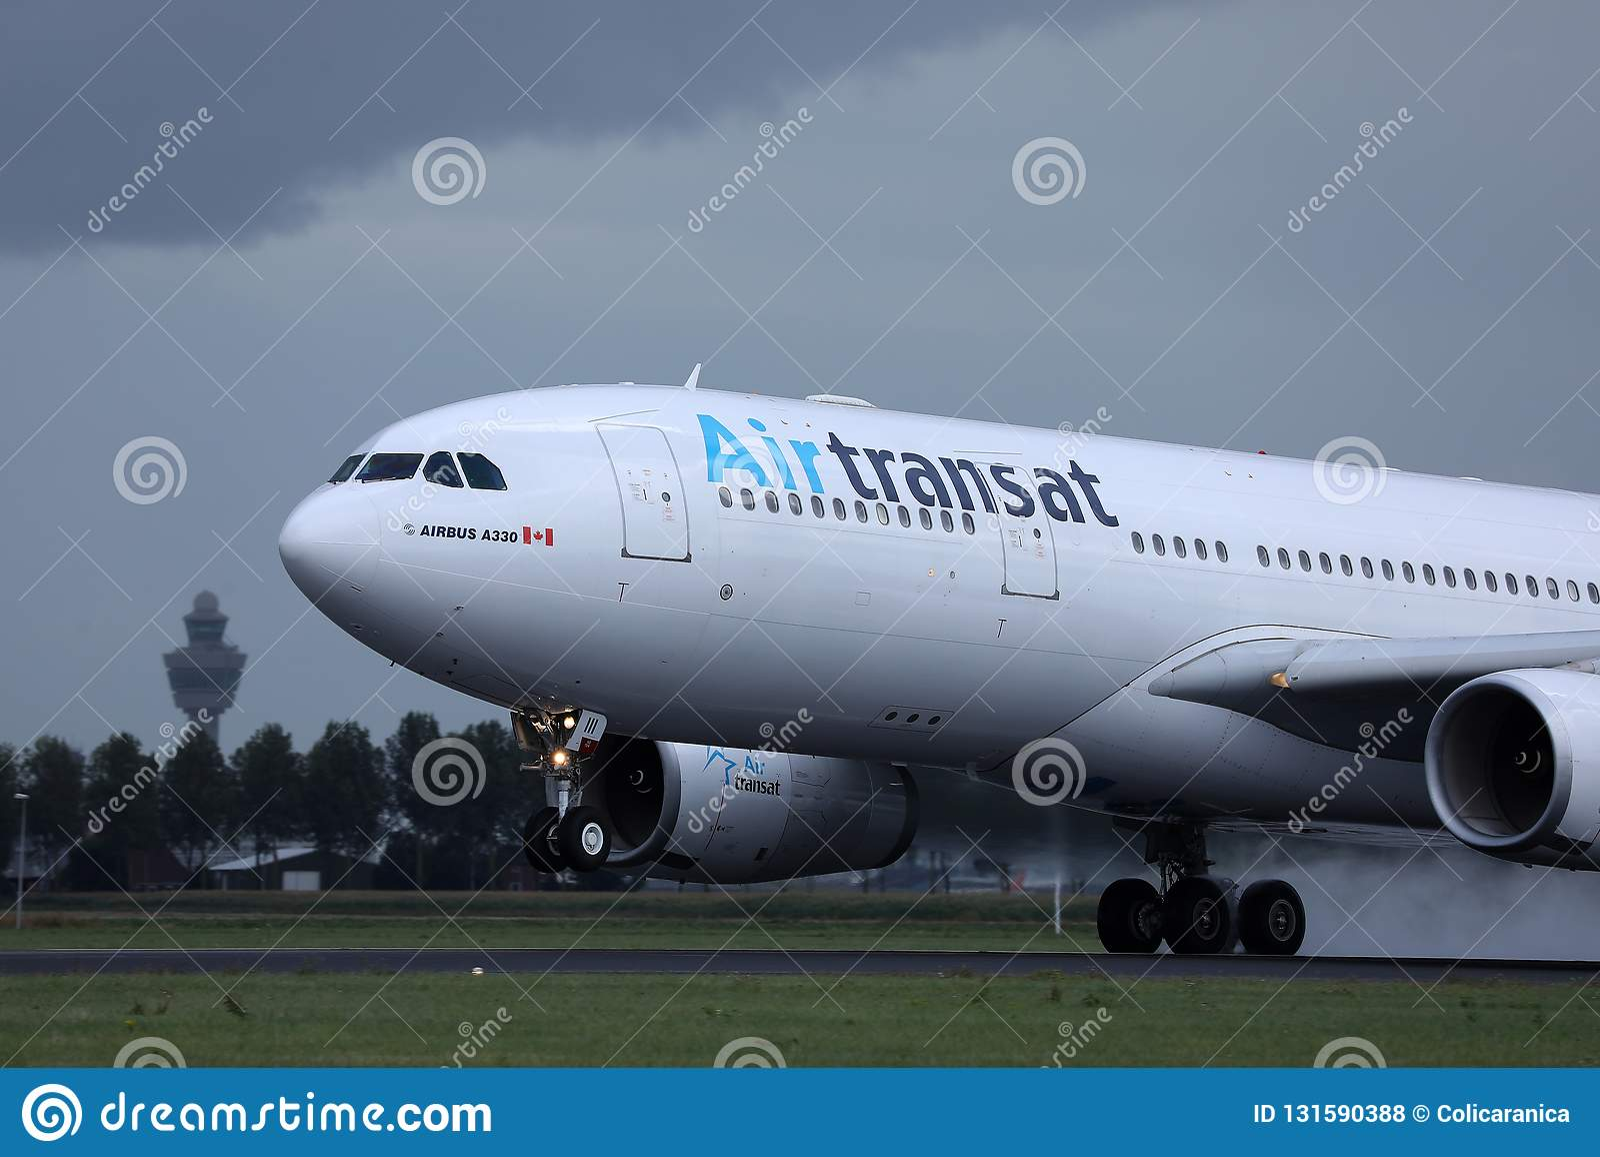 Air Transat jet landing on the runway